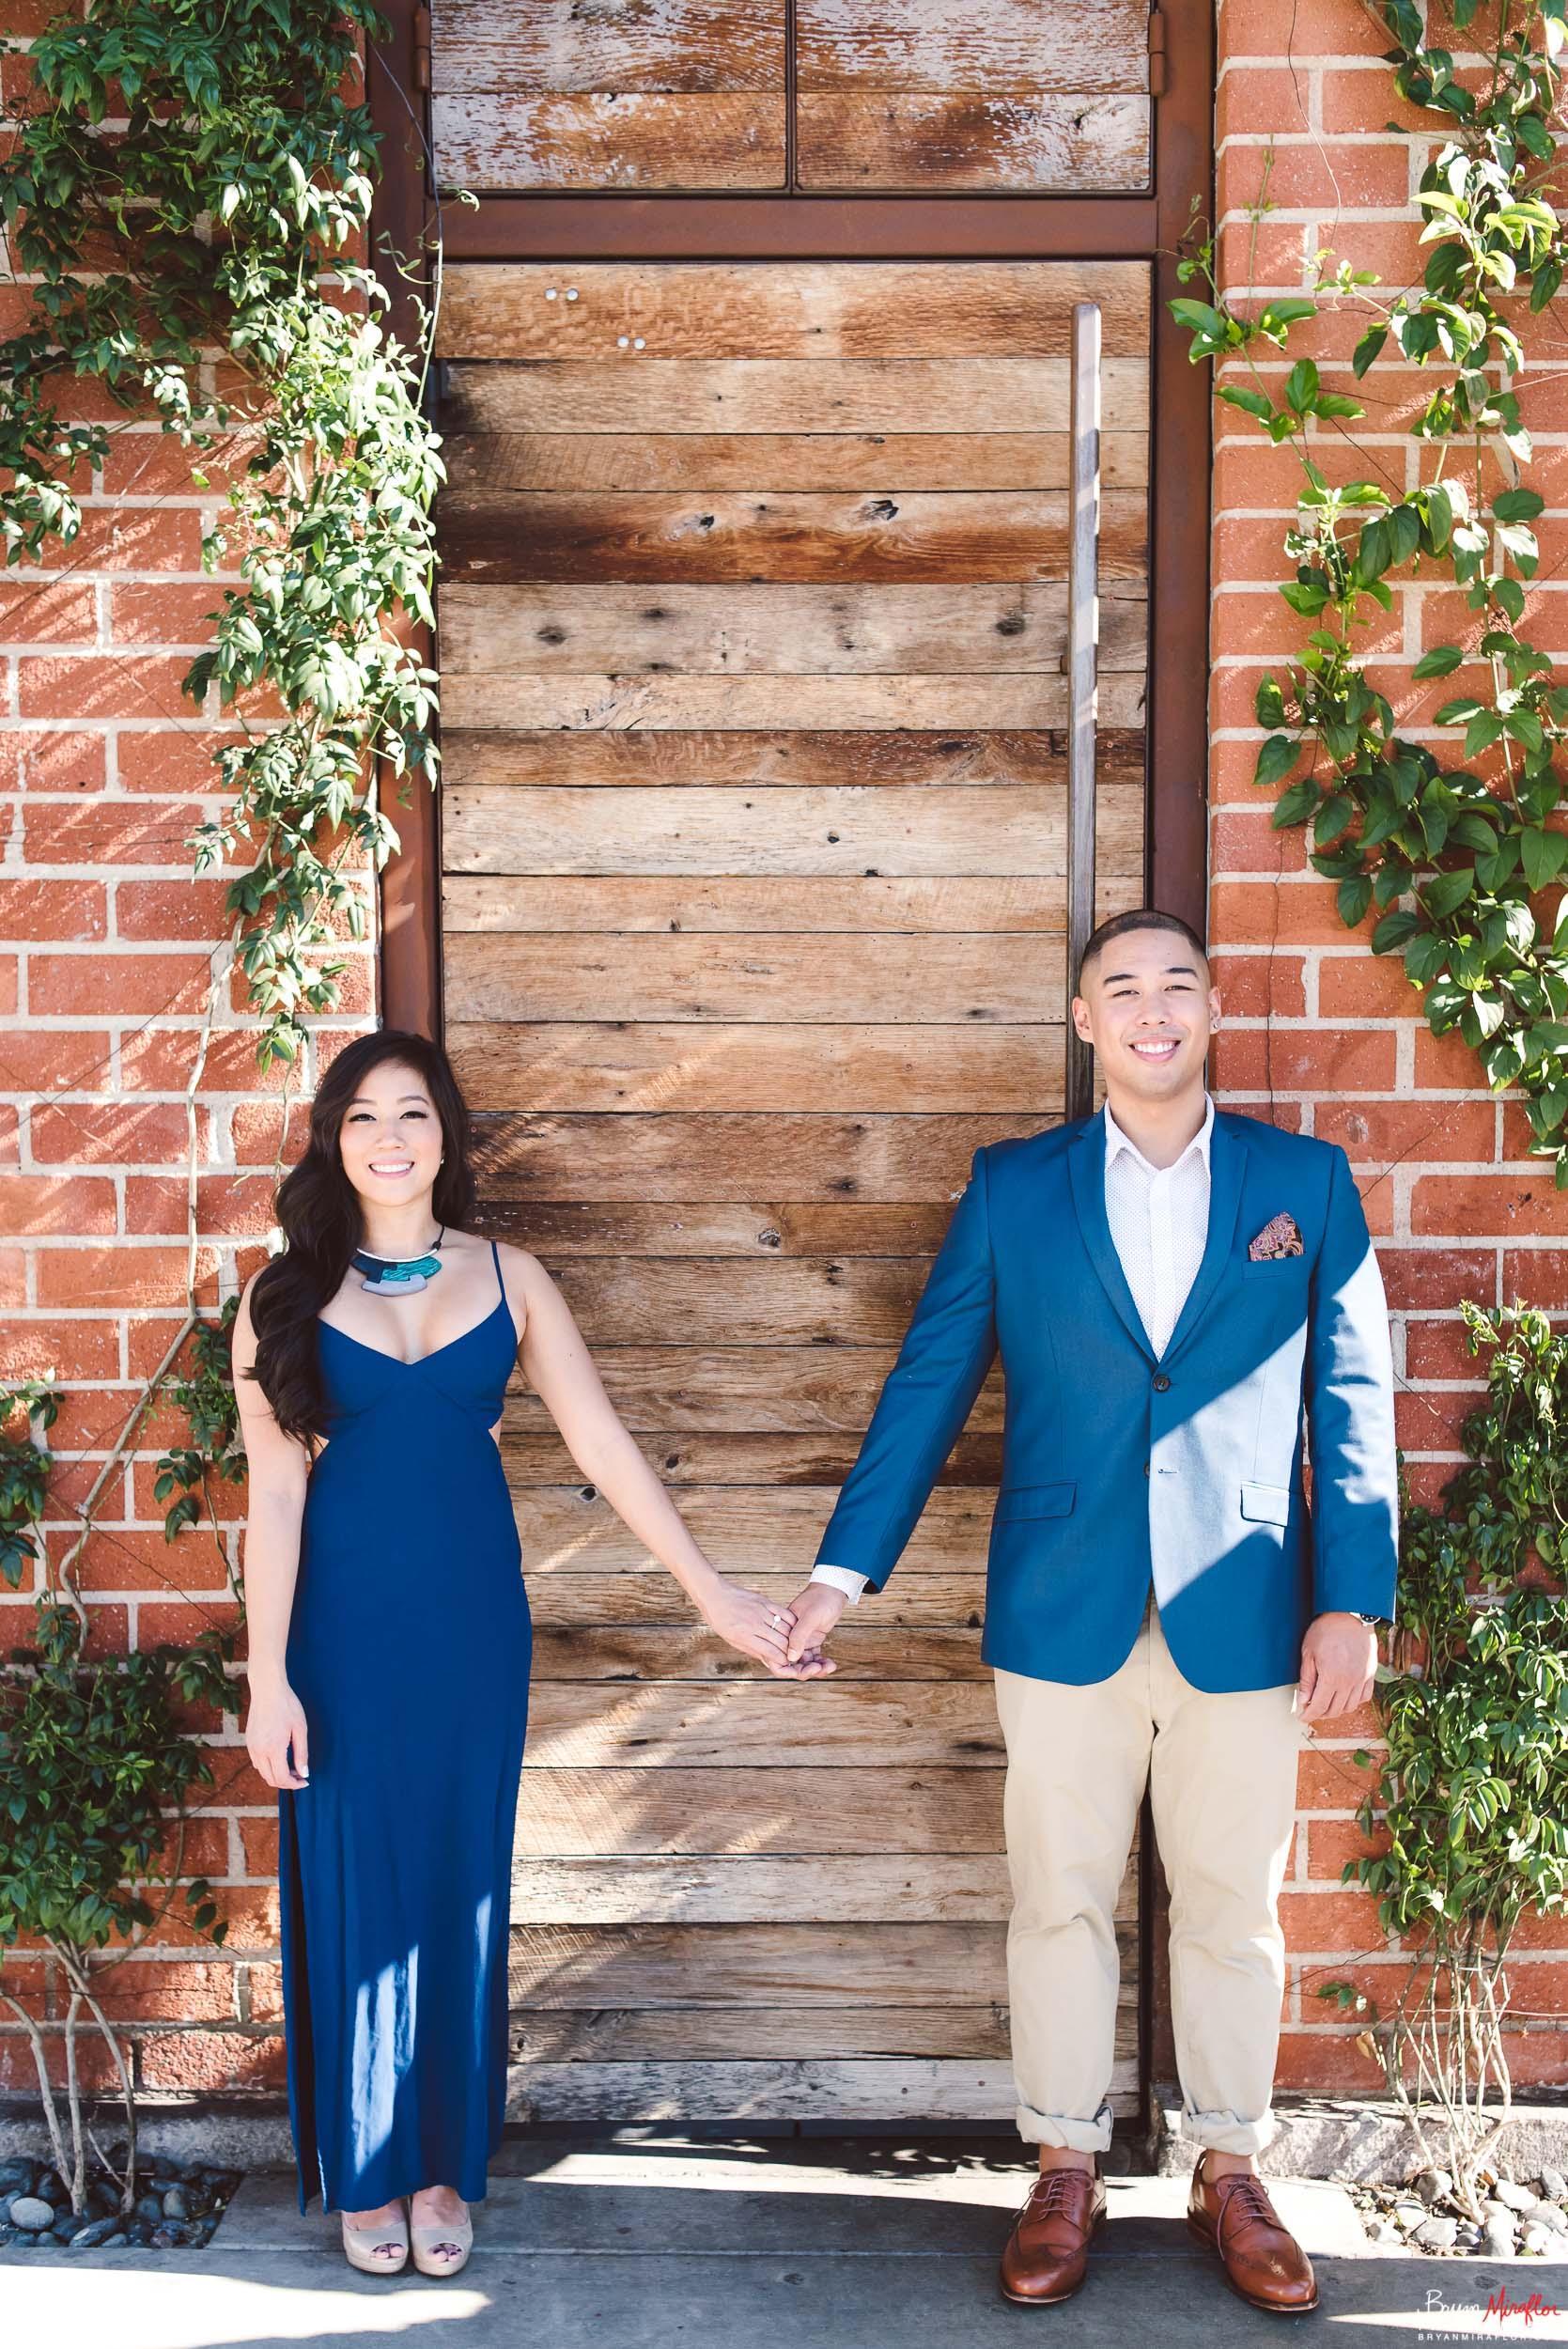 Bryan-Miraflor-Photography-Trisha-Dexter-Lopez-Engagement-Formal-DTLA-Arts-20170129-0072.jpg